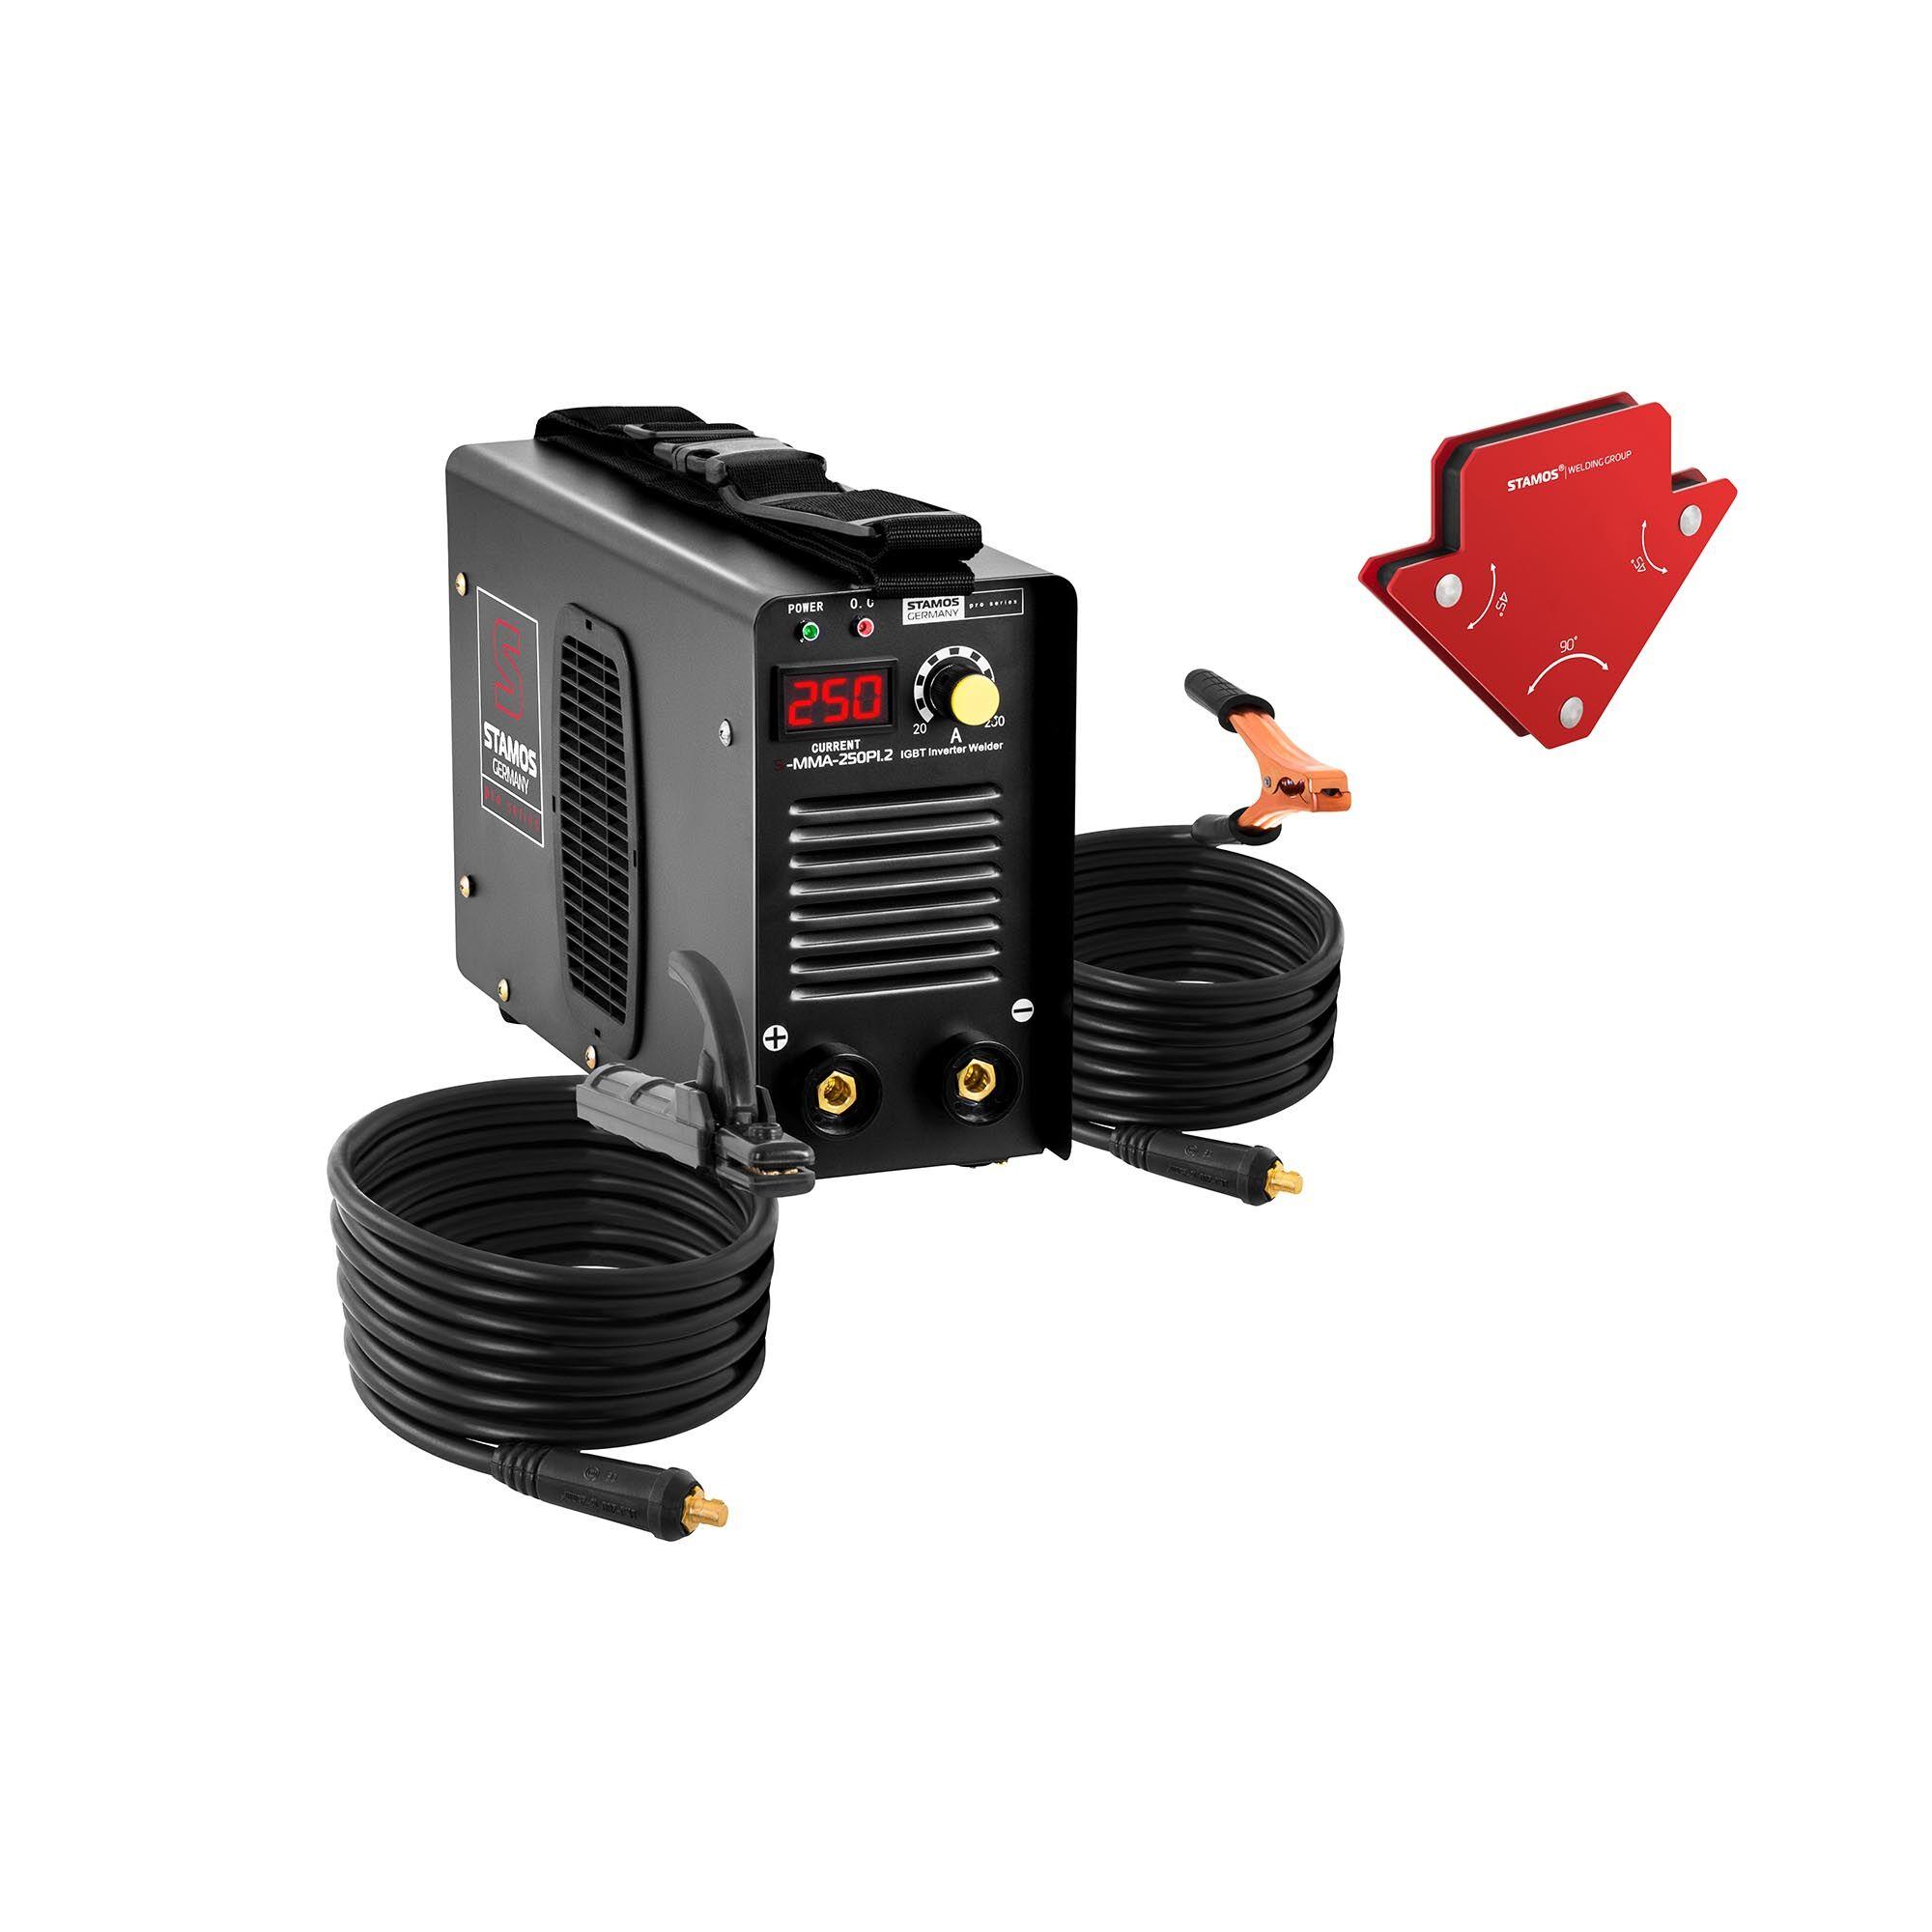 stamos pro series saldatrice mma - set con 2 angoli magnetici per la saldatura - 250 a - cavo 8 m - hot start s-mma-250pi.2-set-1